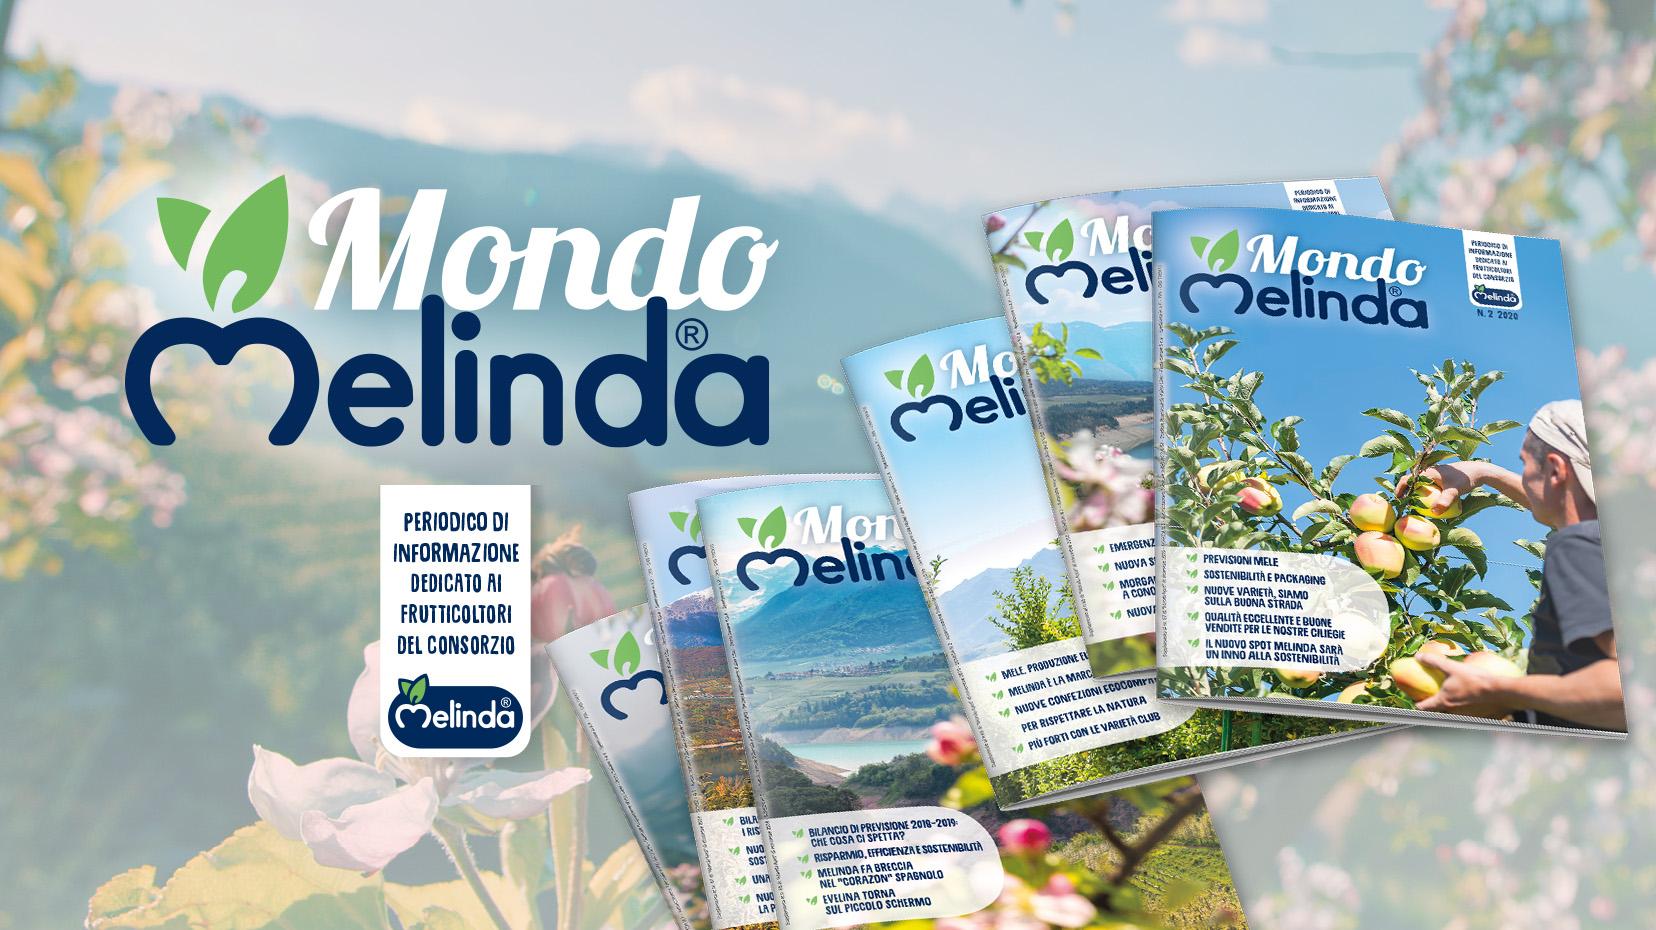 Mondo Melinda Brand Magazine